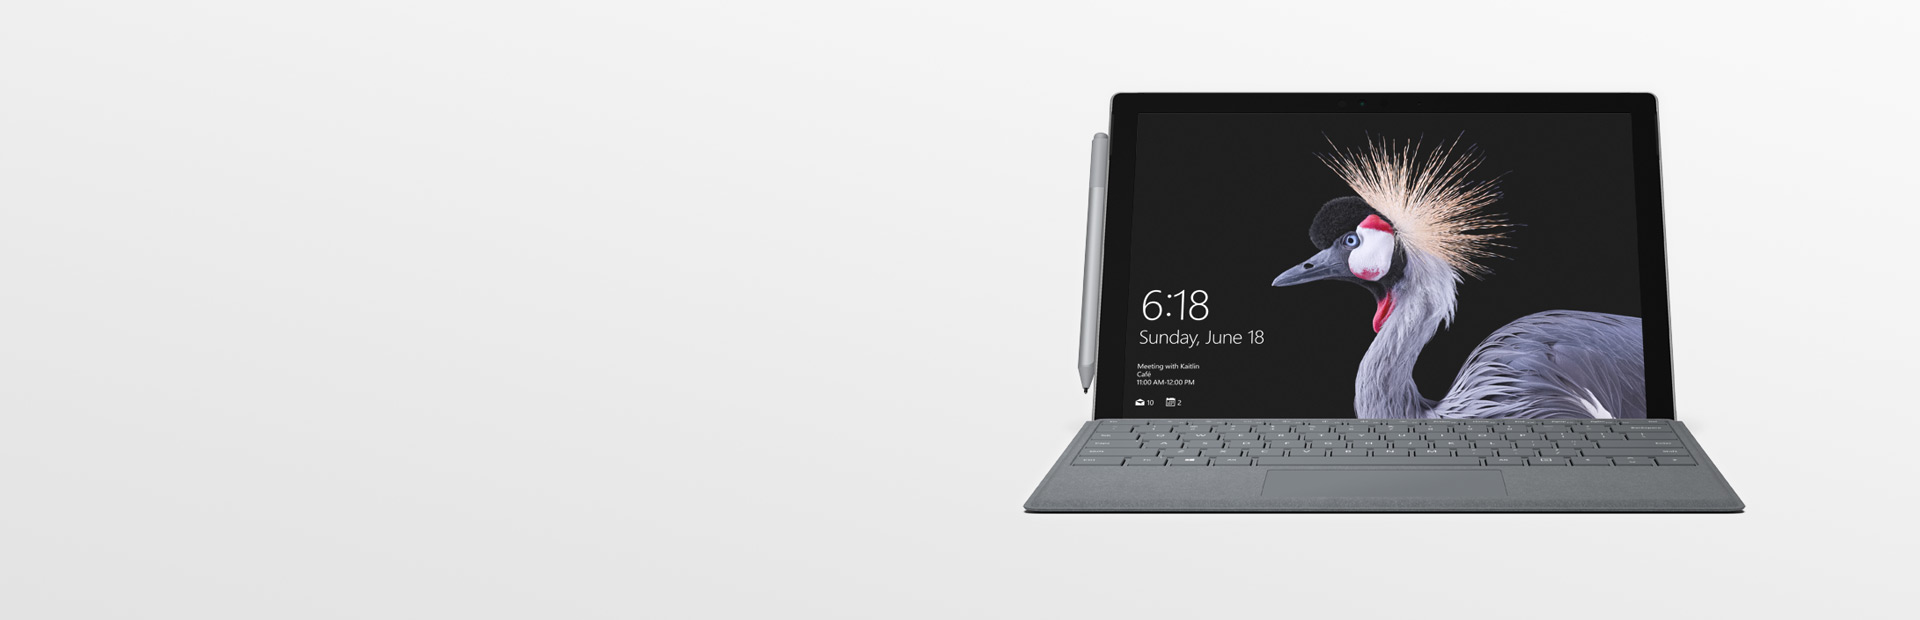 Surface Pro mit Surface-Stift